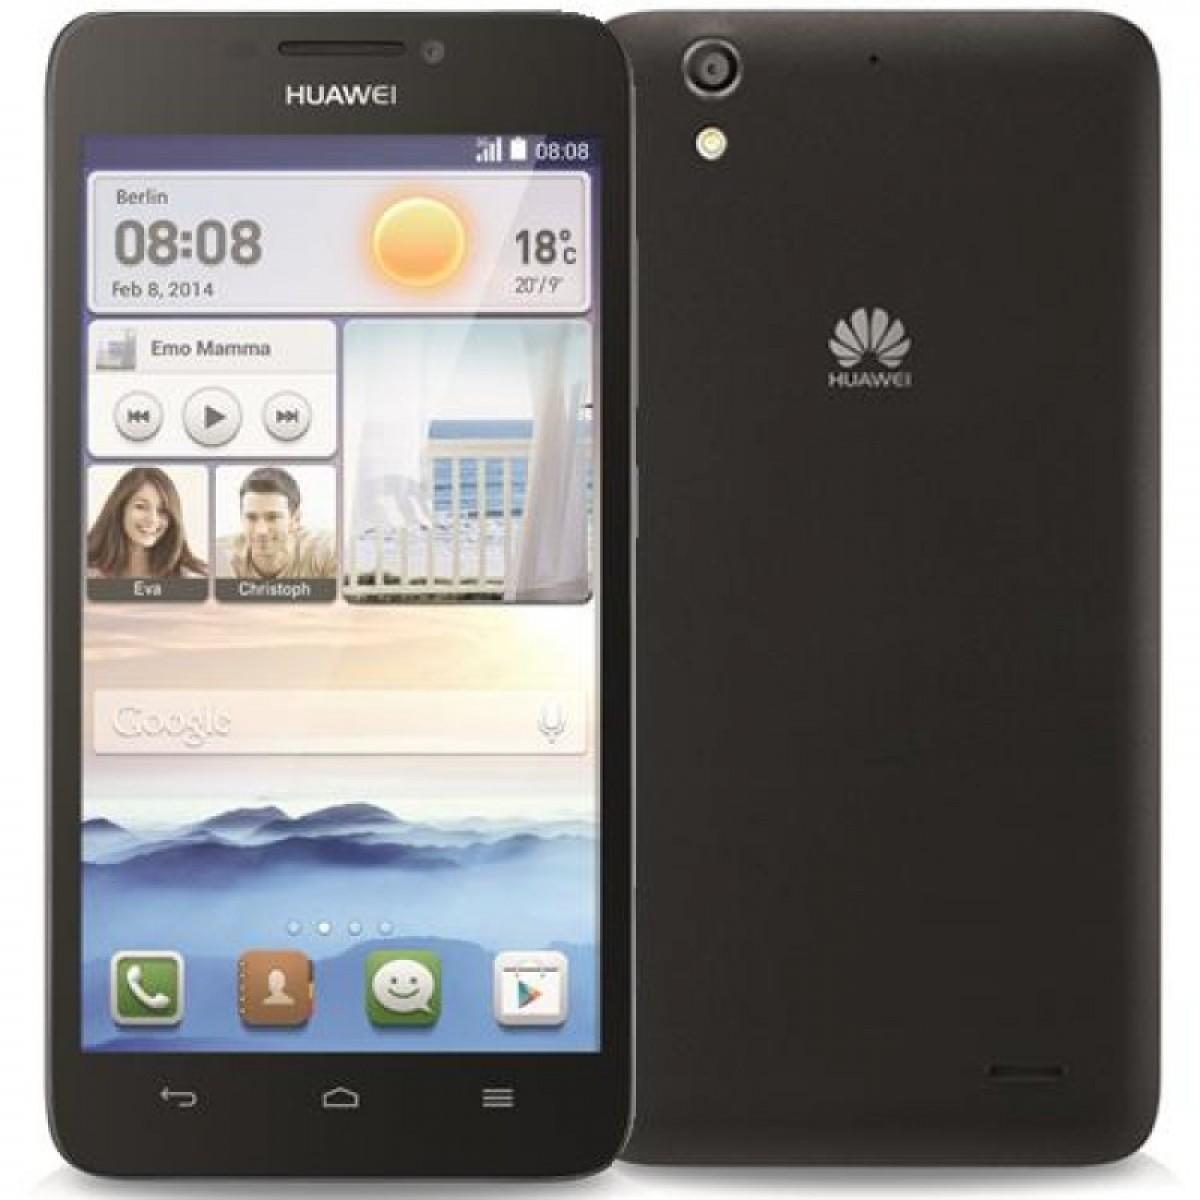 HUAWEI - Smartphone G630 prix tunisie